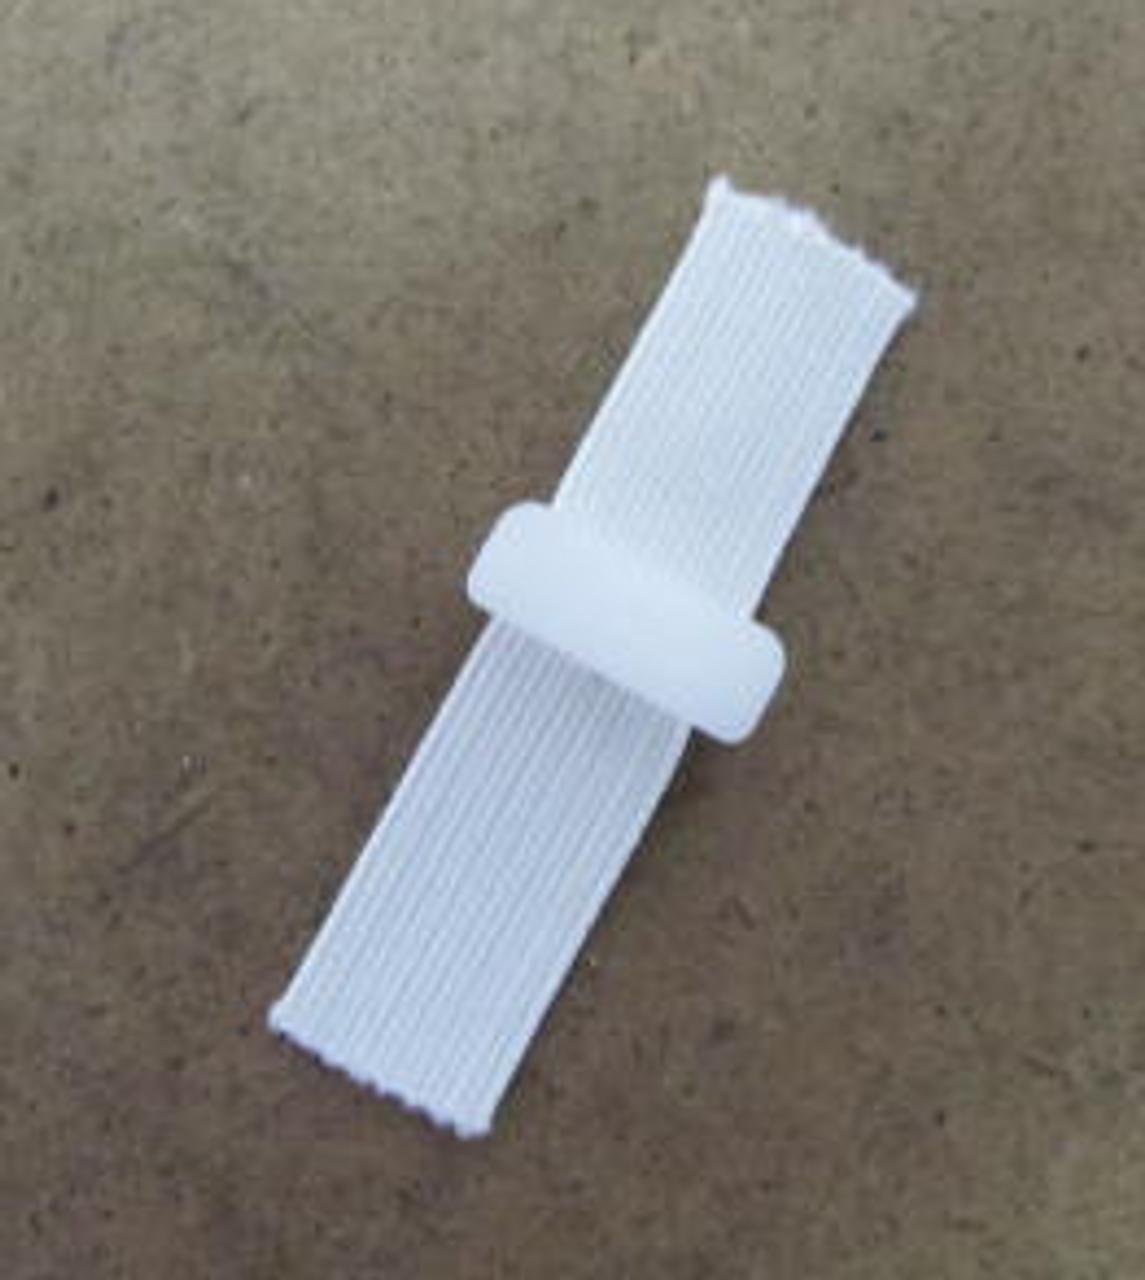 T - CURTAIN SEW-IN ELASTIC CARRIER - TYPE C (20-1123)